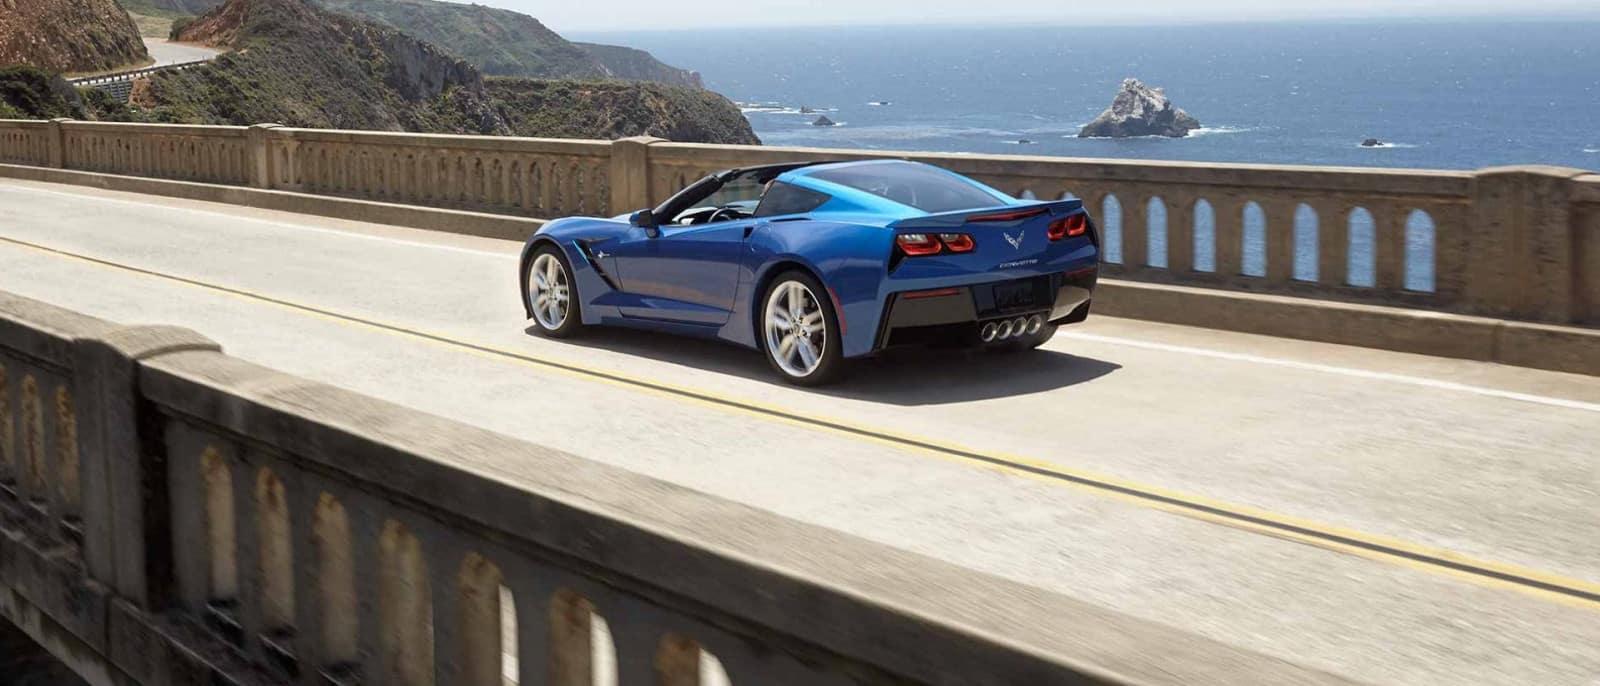 2014 Chevy Corvette Stingray rear side view